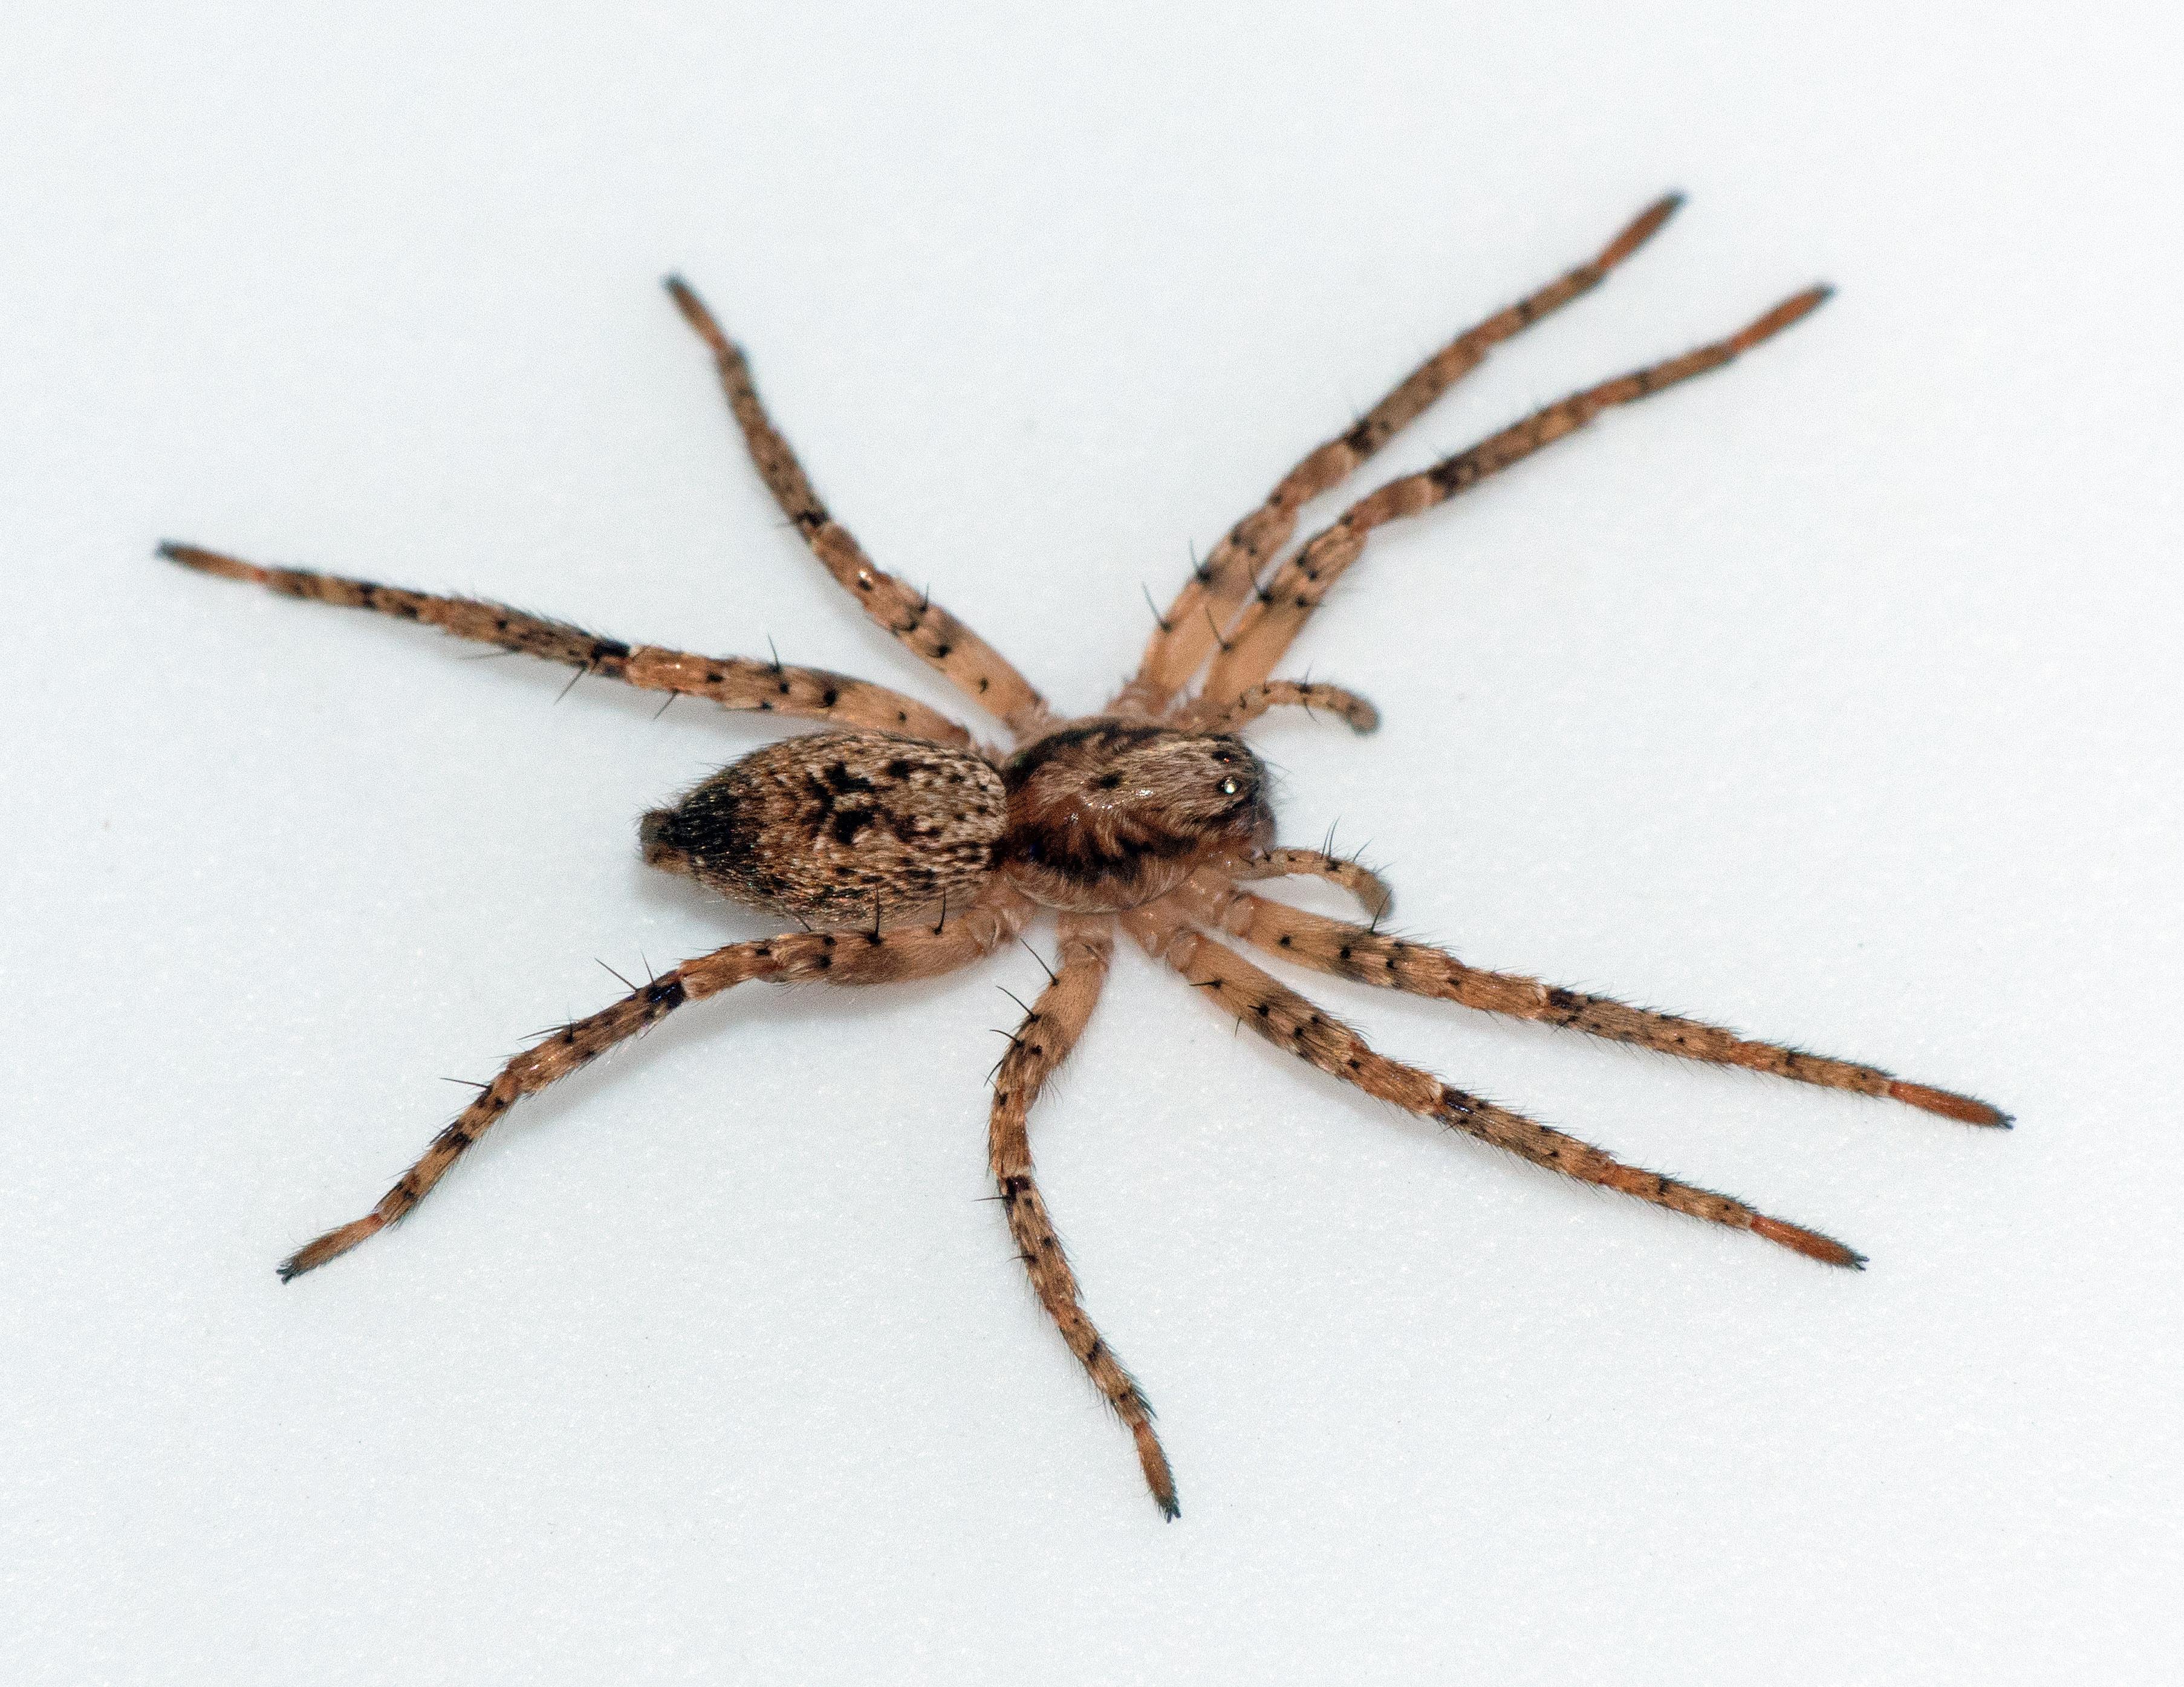 Picture of Anyphaena aperta - Female - Dorsal